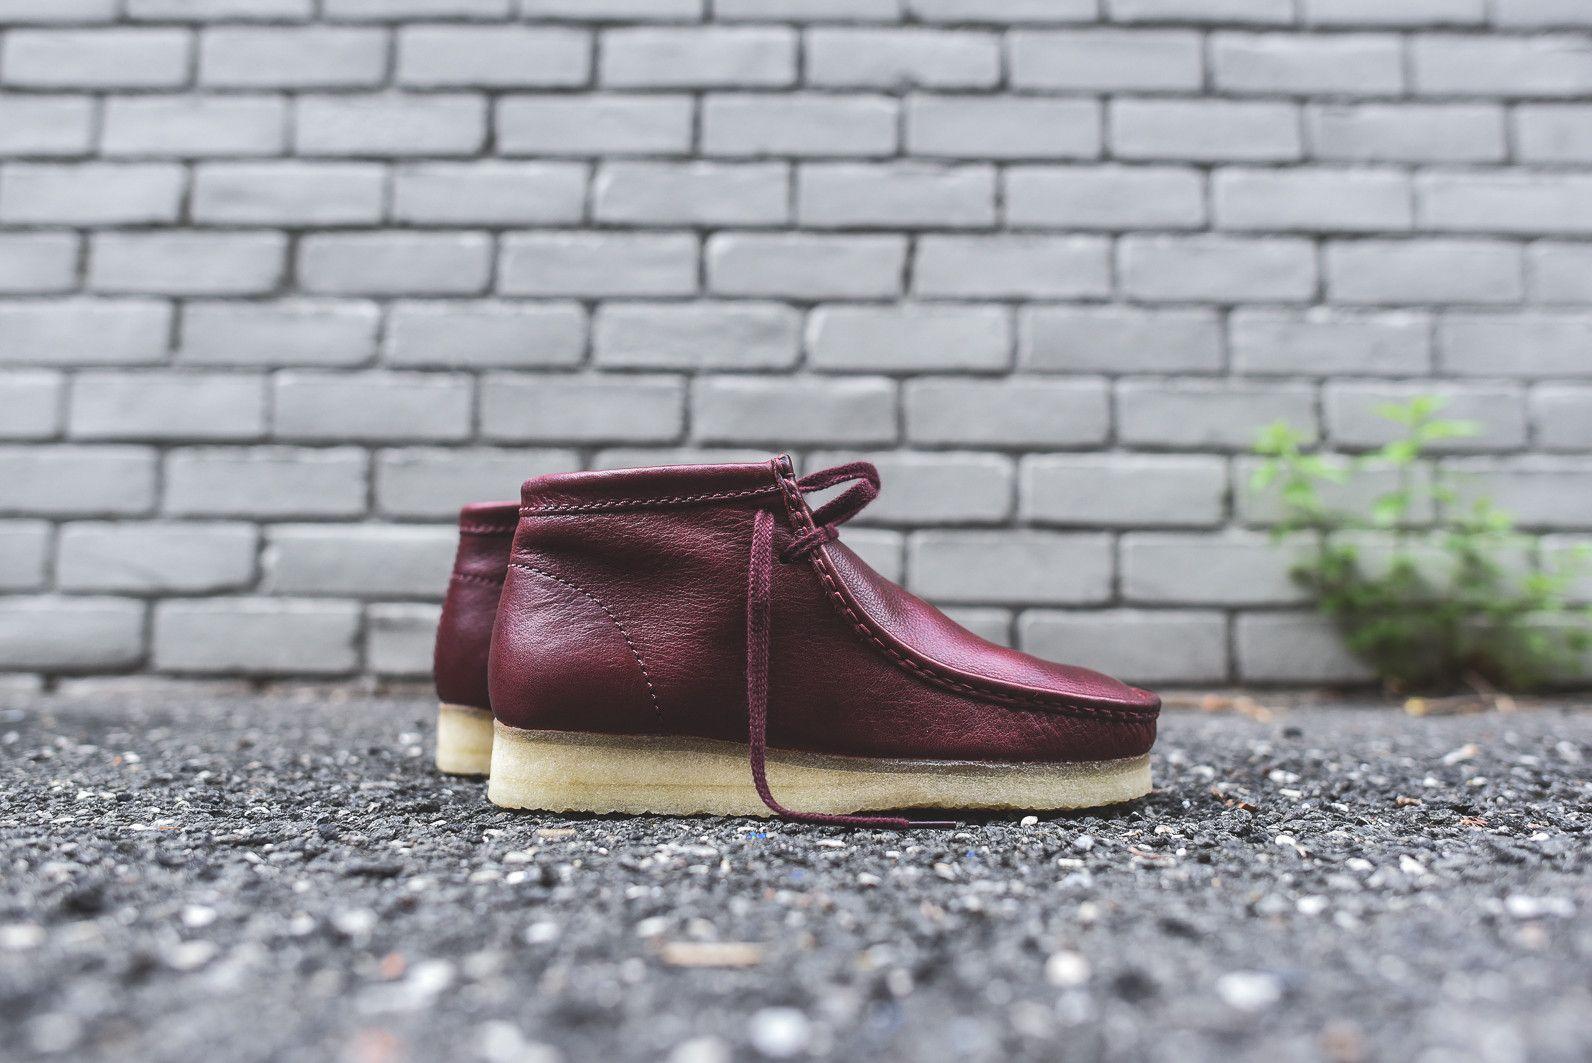 Clarks Wallabee Boot - Burgundy